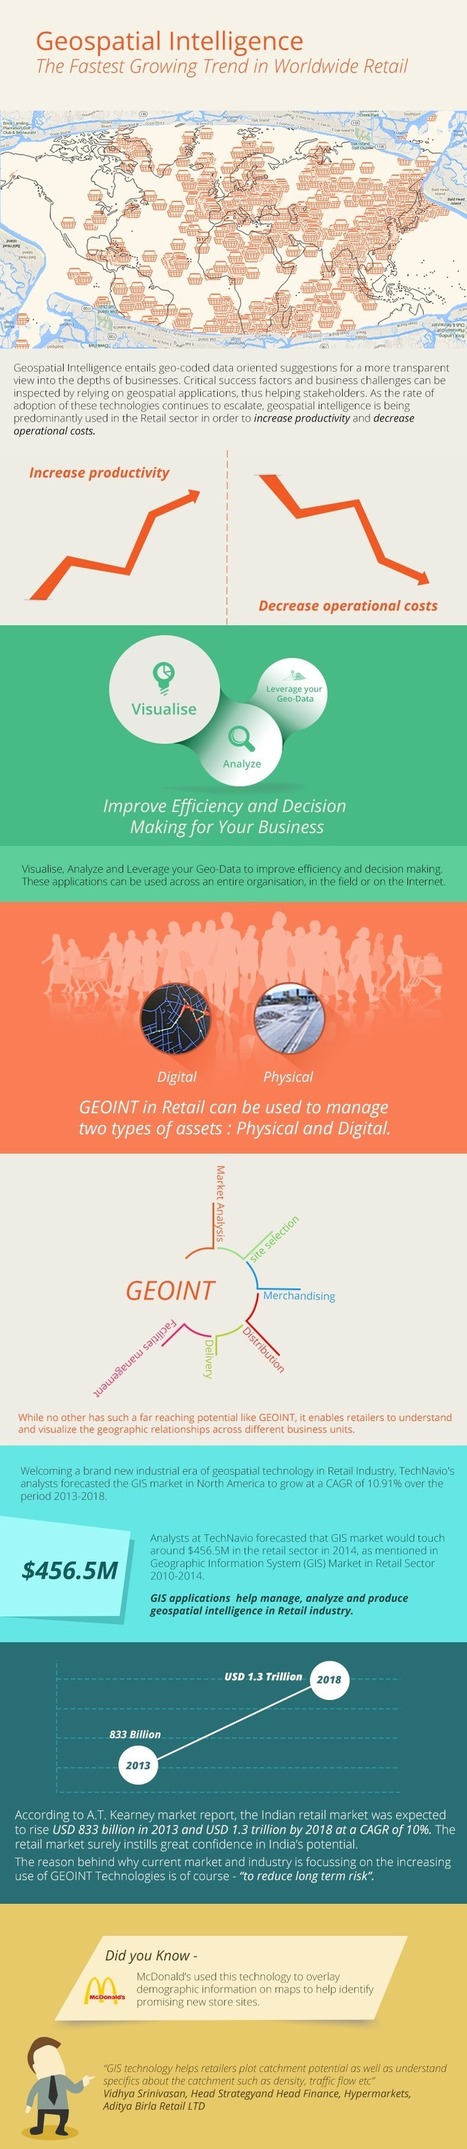 Geospatial Intelligence - The Fastest Growing Trend in Worldwide Retail | MediaAgility | Scoop.it